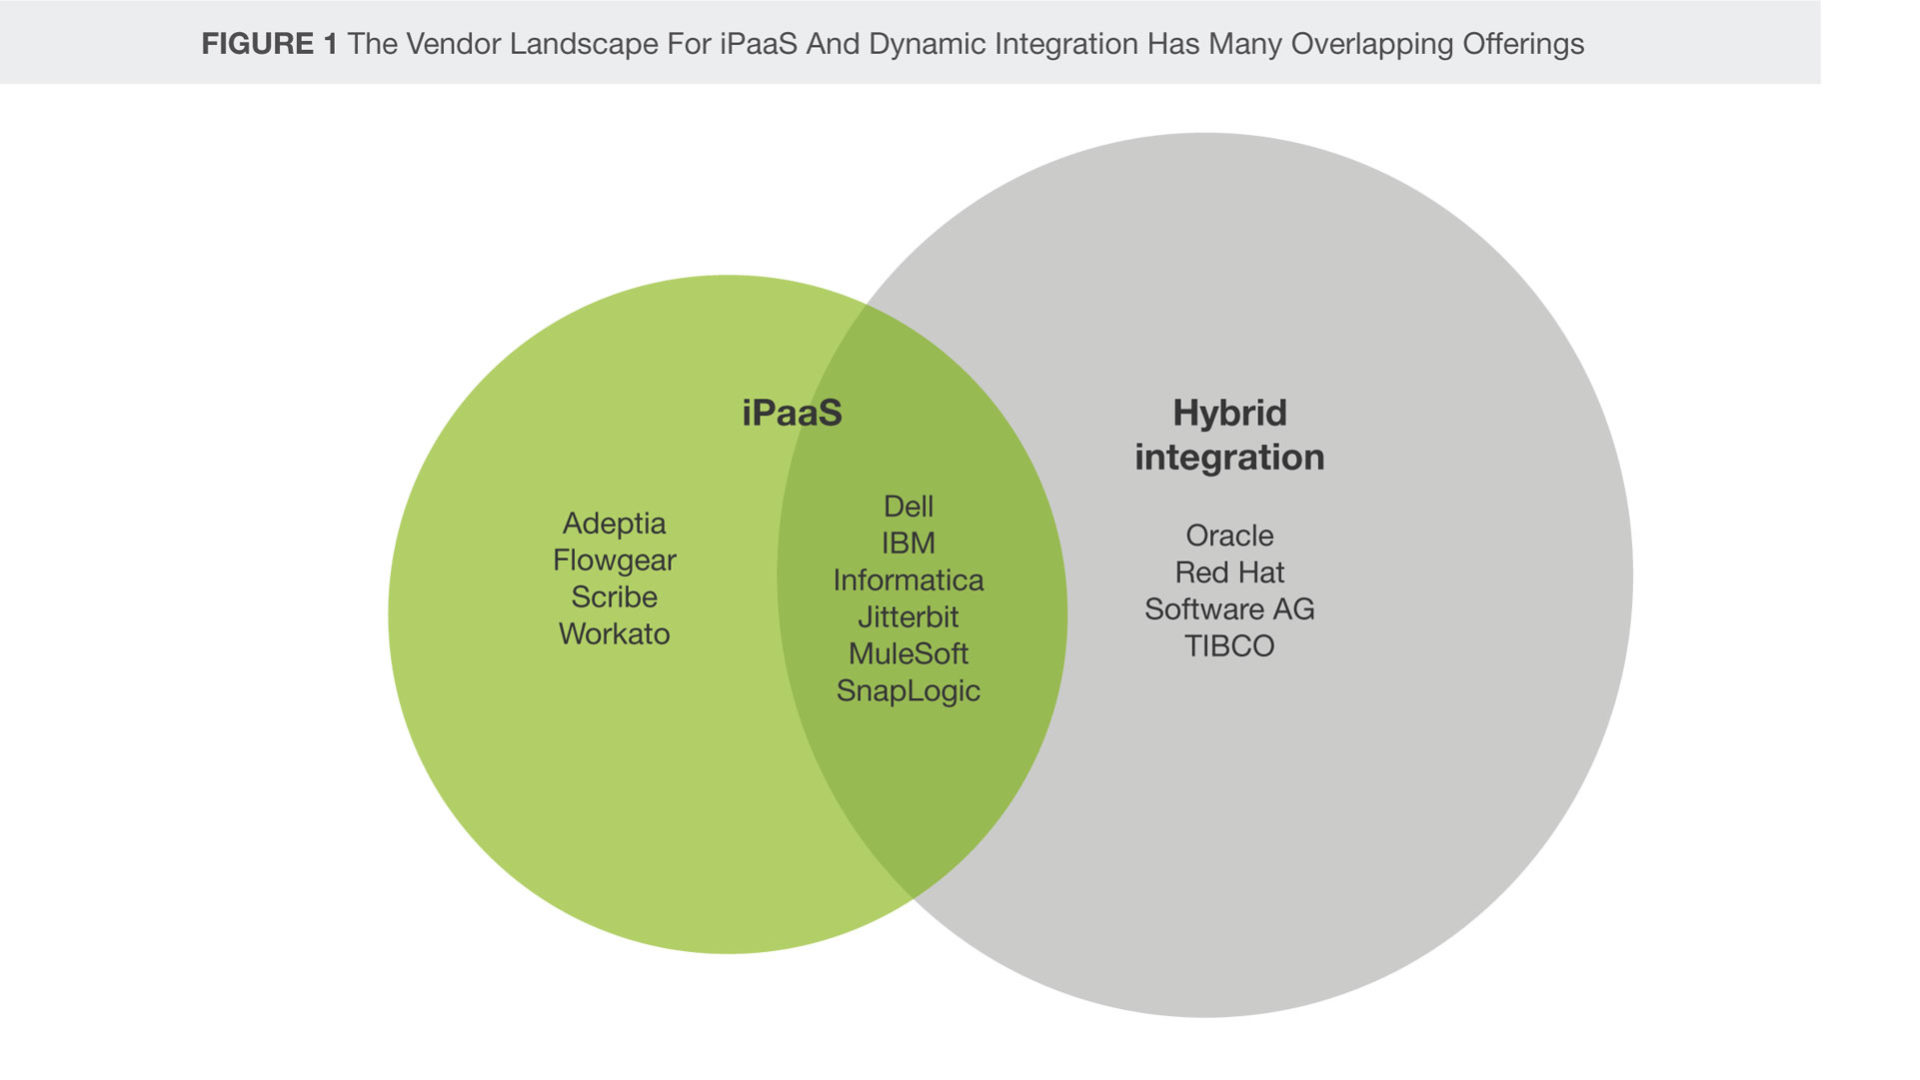 Sovrapposizione IpaaS e Hybrid Integration